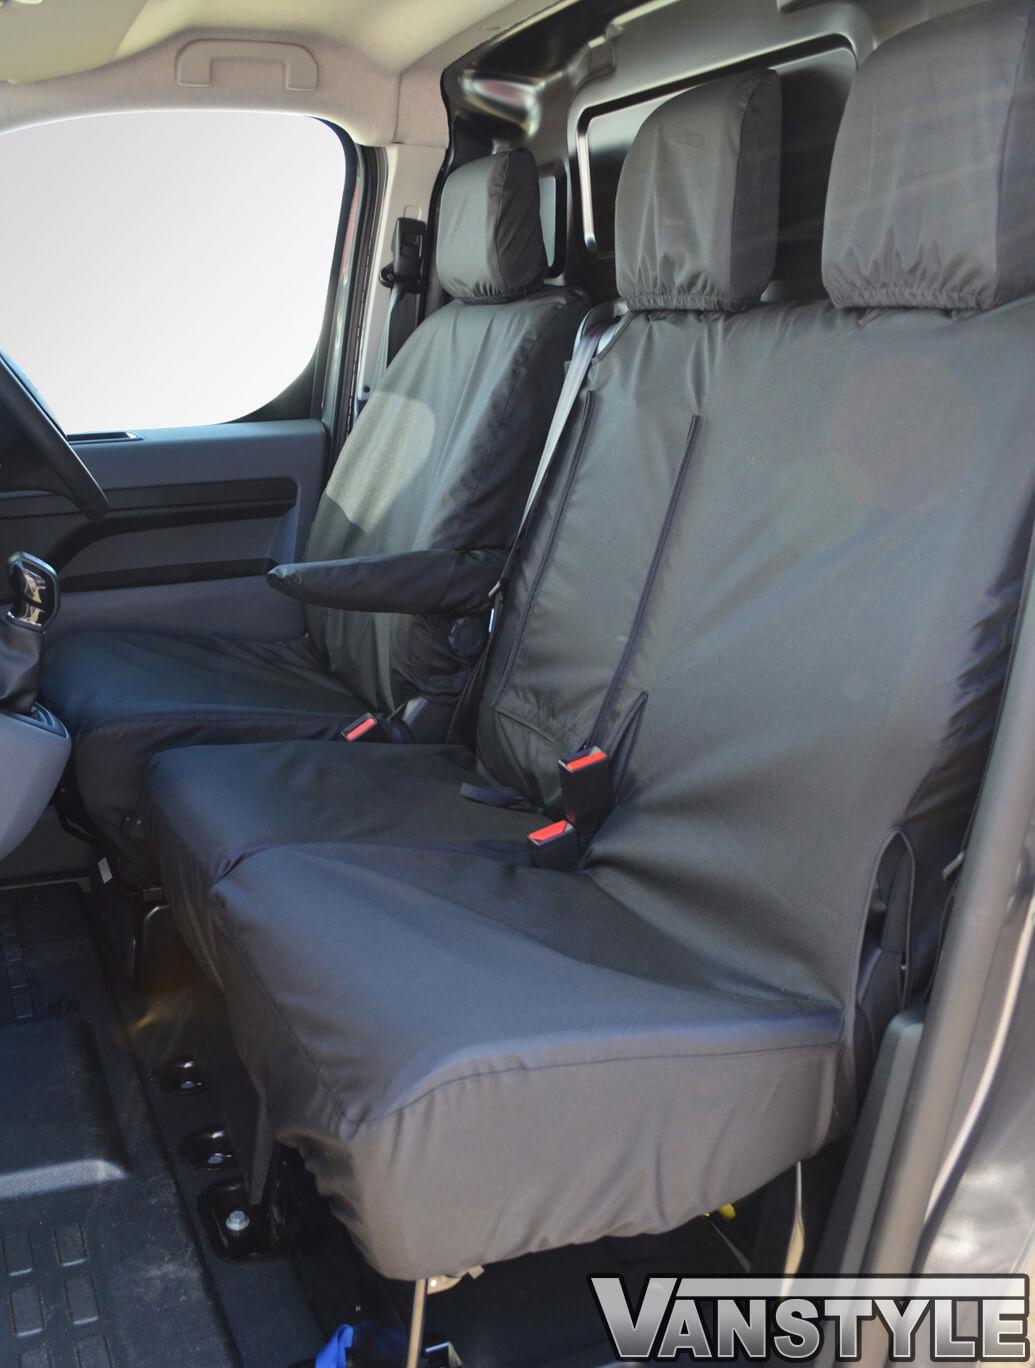 CITROEN GRAND C4 PICASSO PREMIUM CAR SEAT COVER PROTECTOR BLACK WATERPROOF